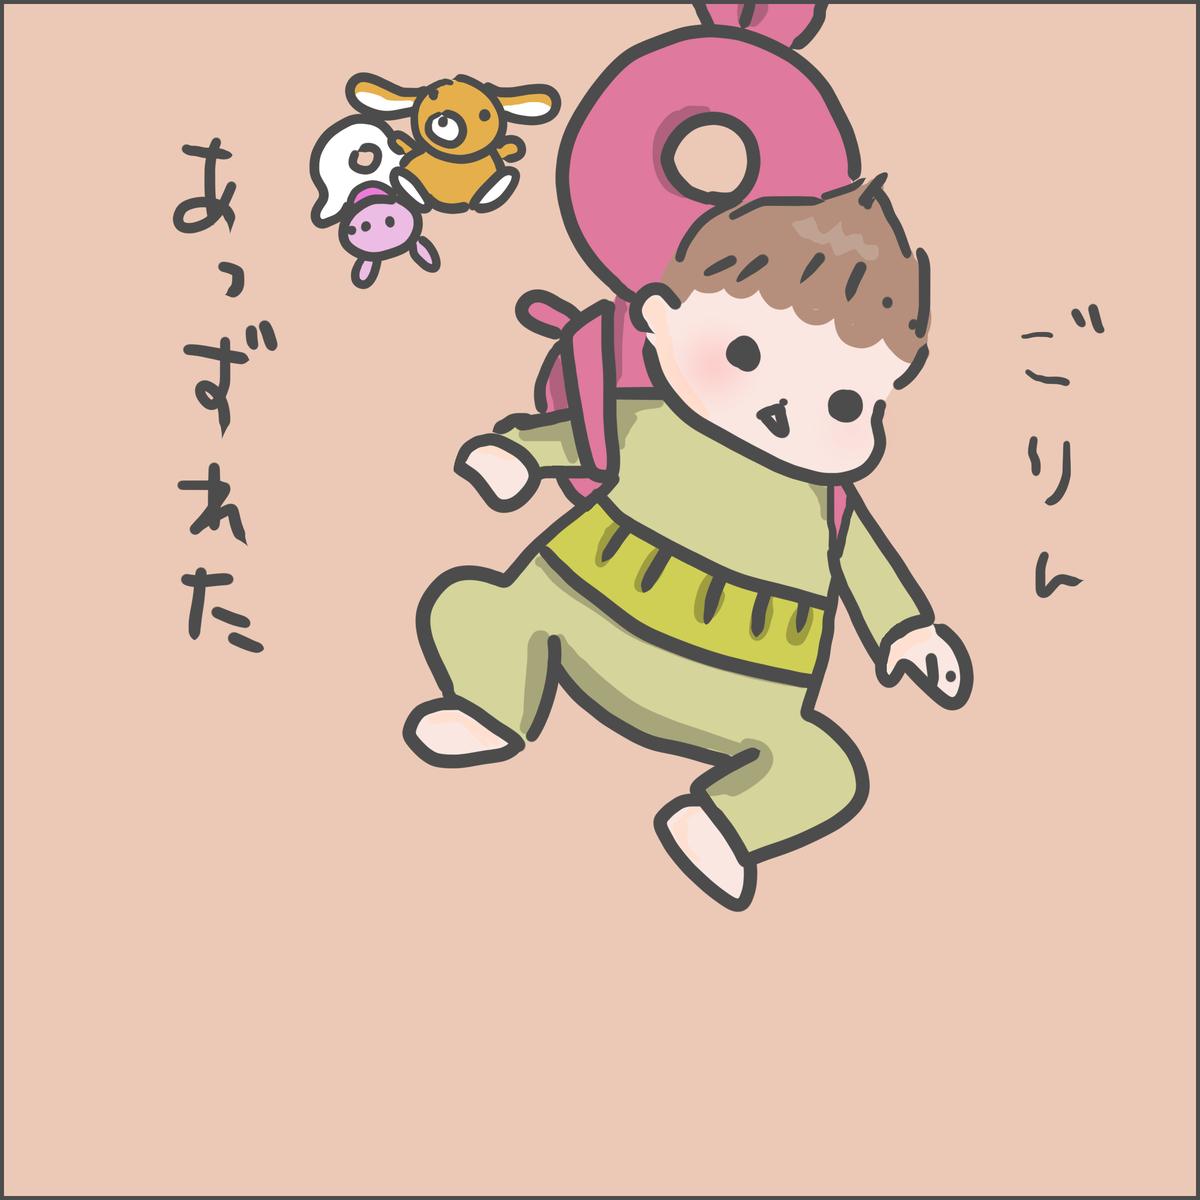 f:id:ika_yoshi:20201206005700j:plain